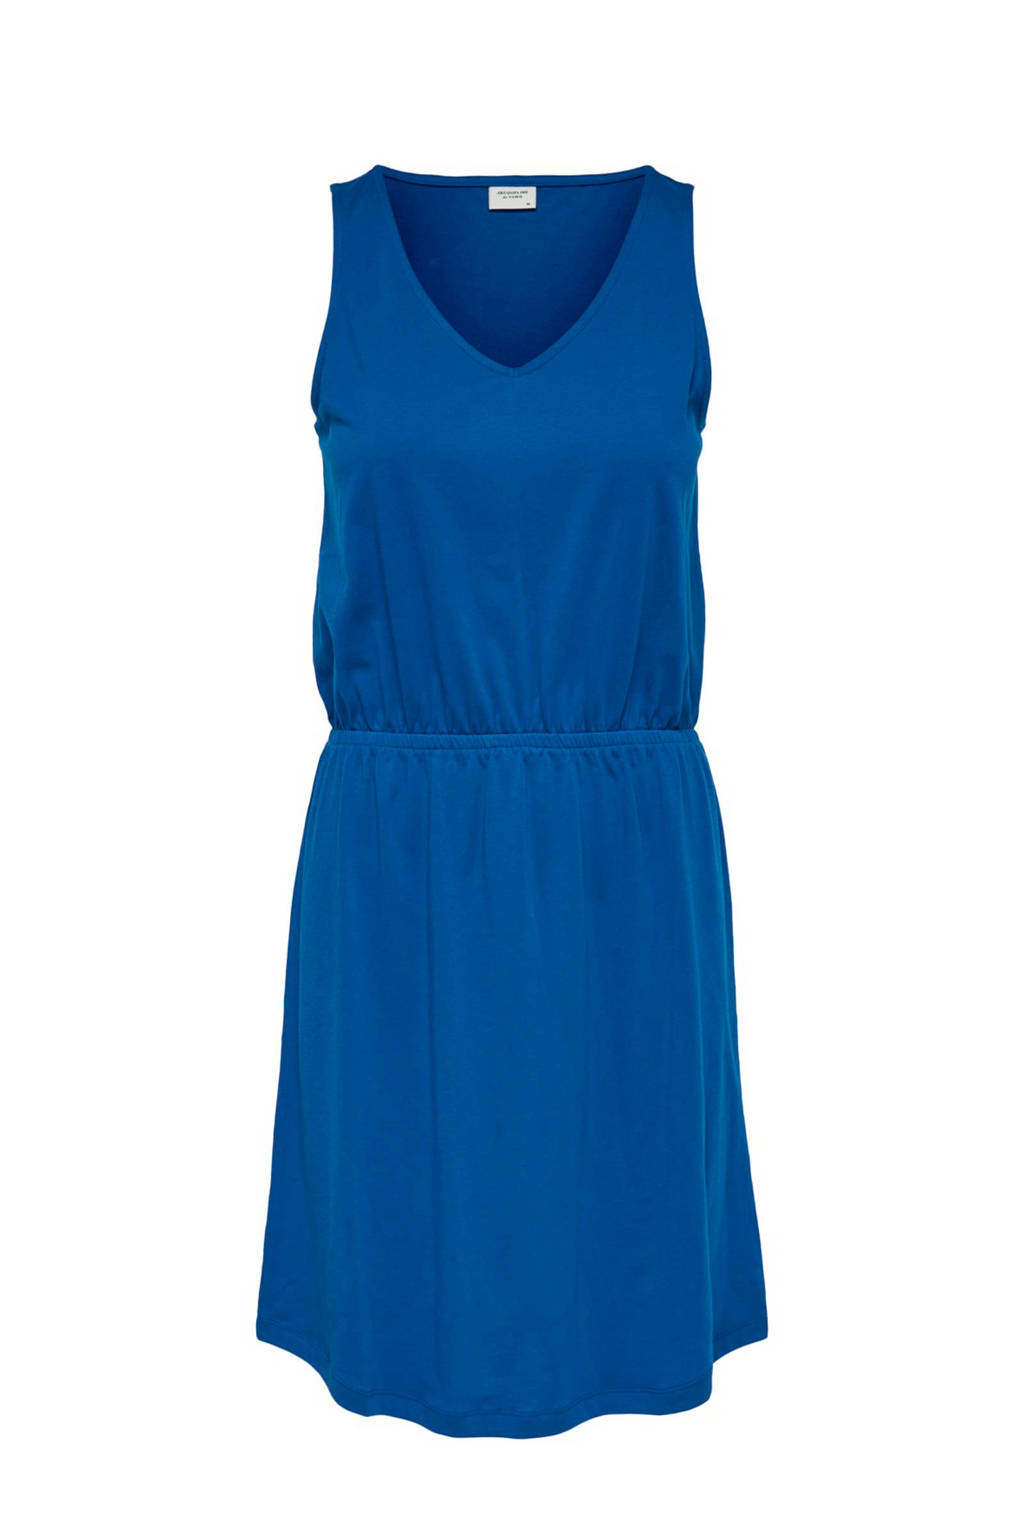 d2f6cc01943f50 JACQUELINE DE YONG mouwloze jurk blauw